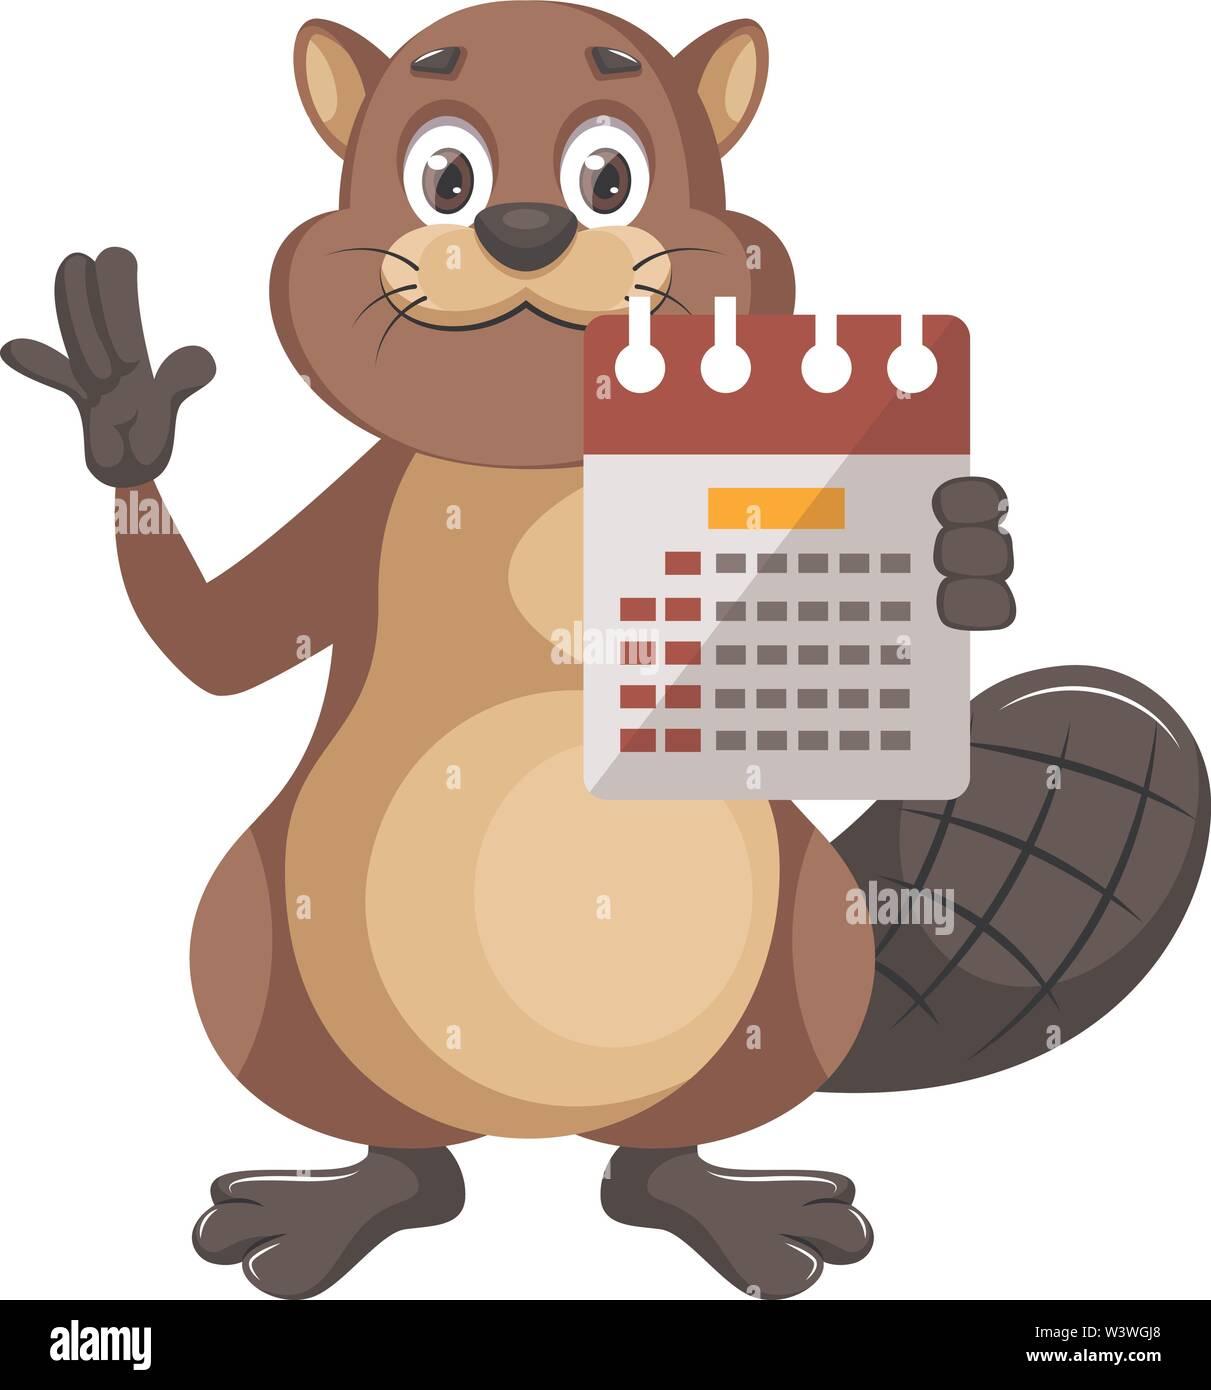 Beaver with calendar, illustration, vector on white background. - Stock Image